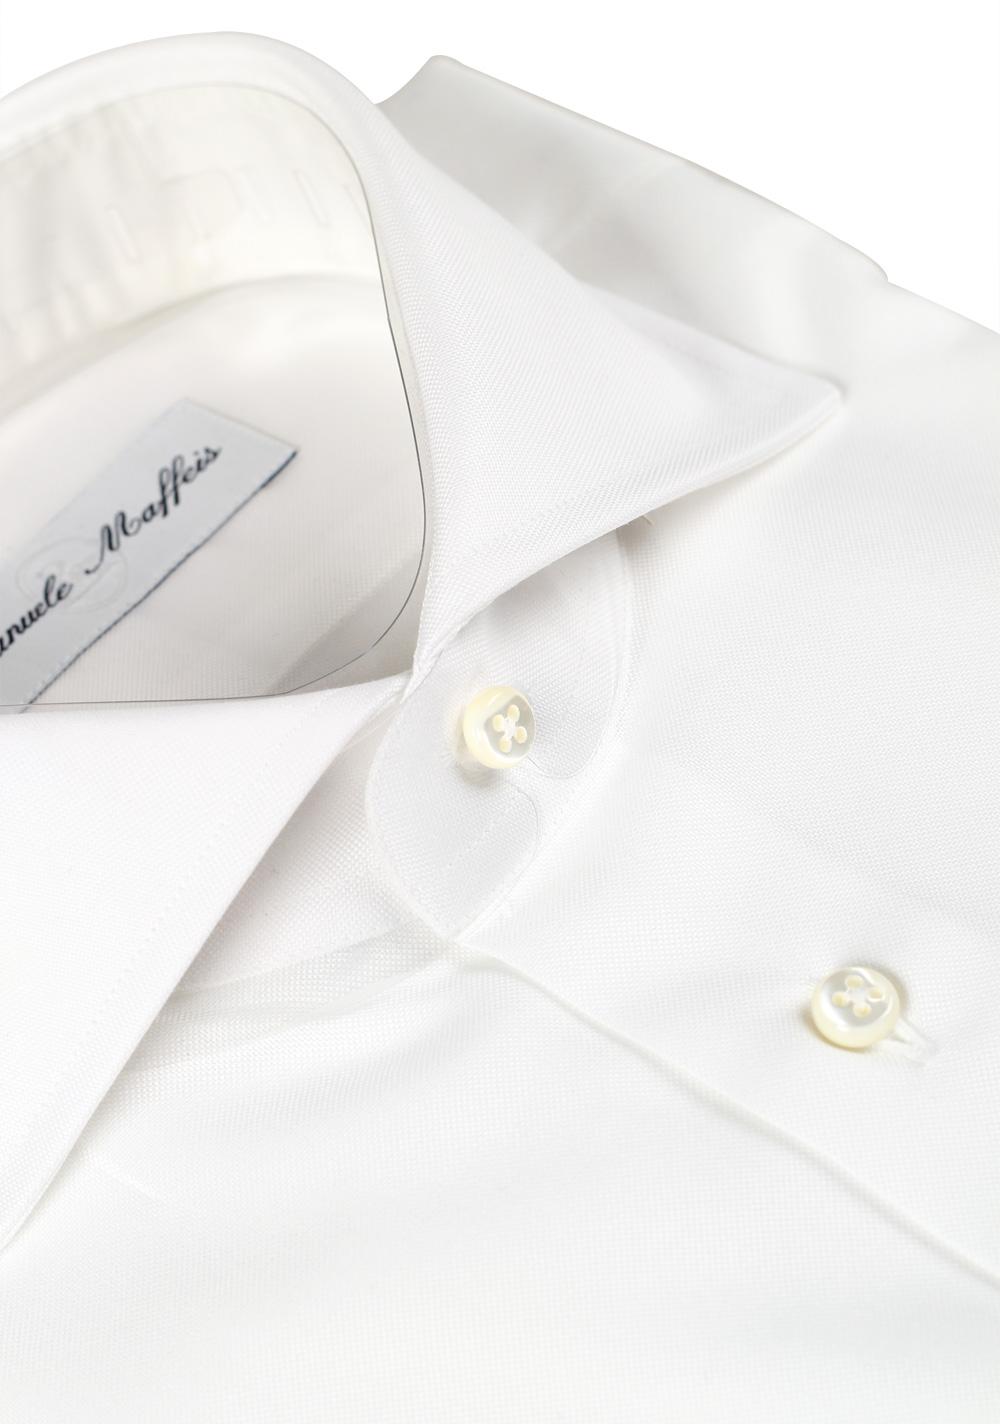 Maffeis Shirt Size 37 / 14.5 U.S. | Costume Limité